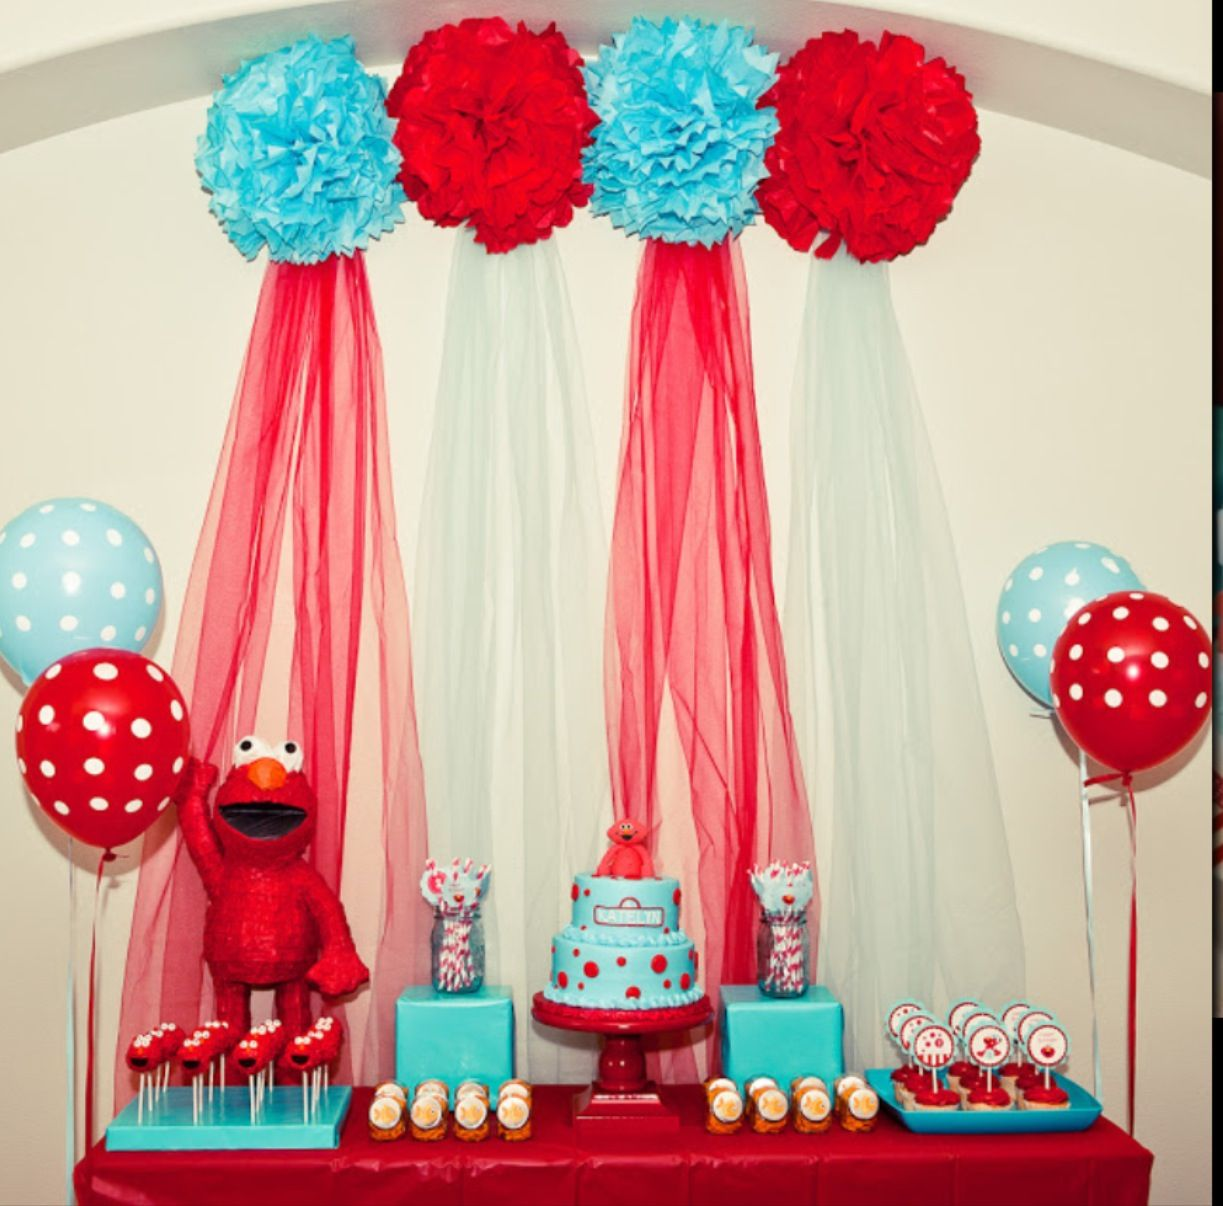 Elmo display table centerpieces Pinterest Elmo Display and